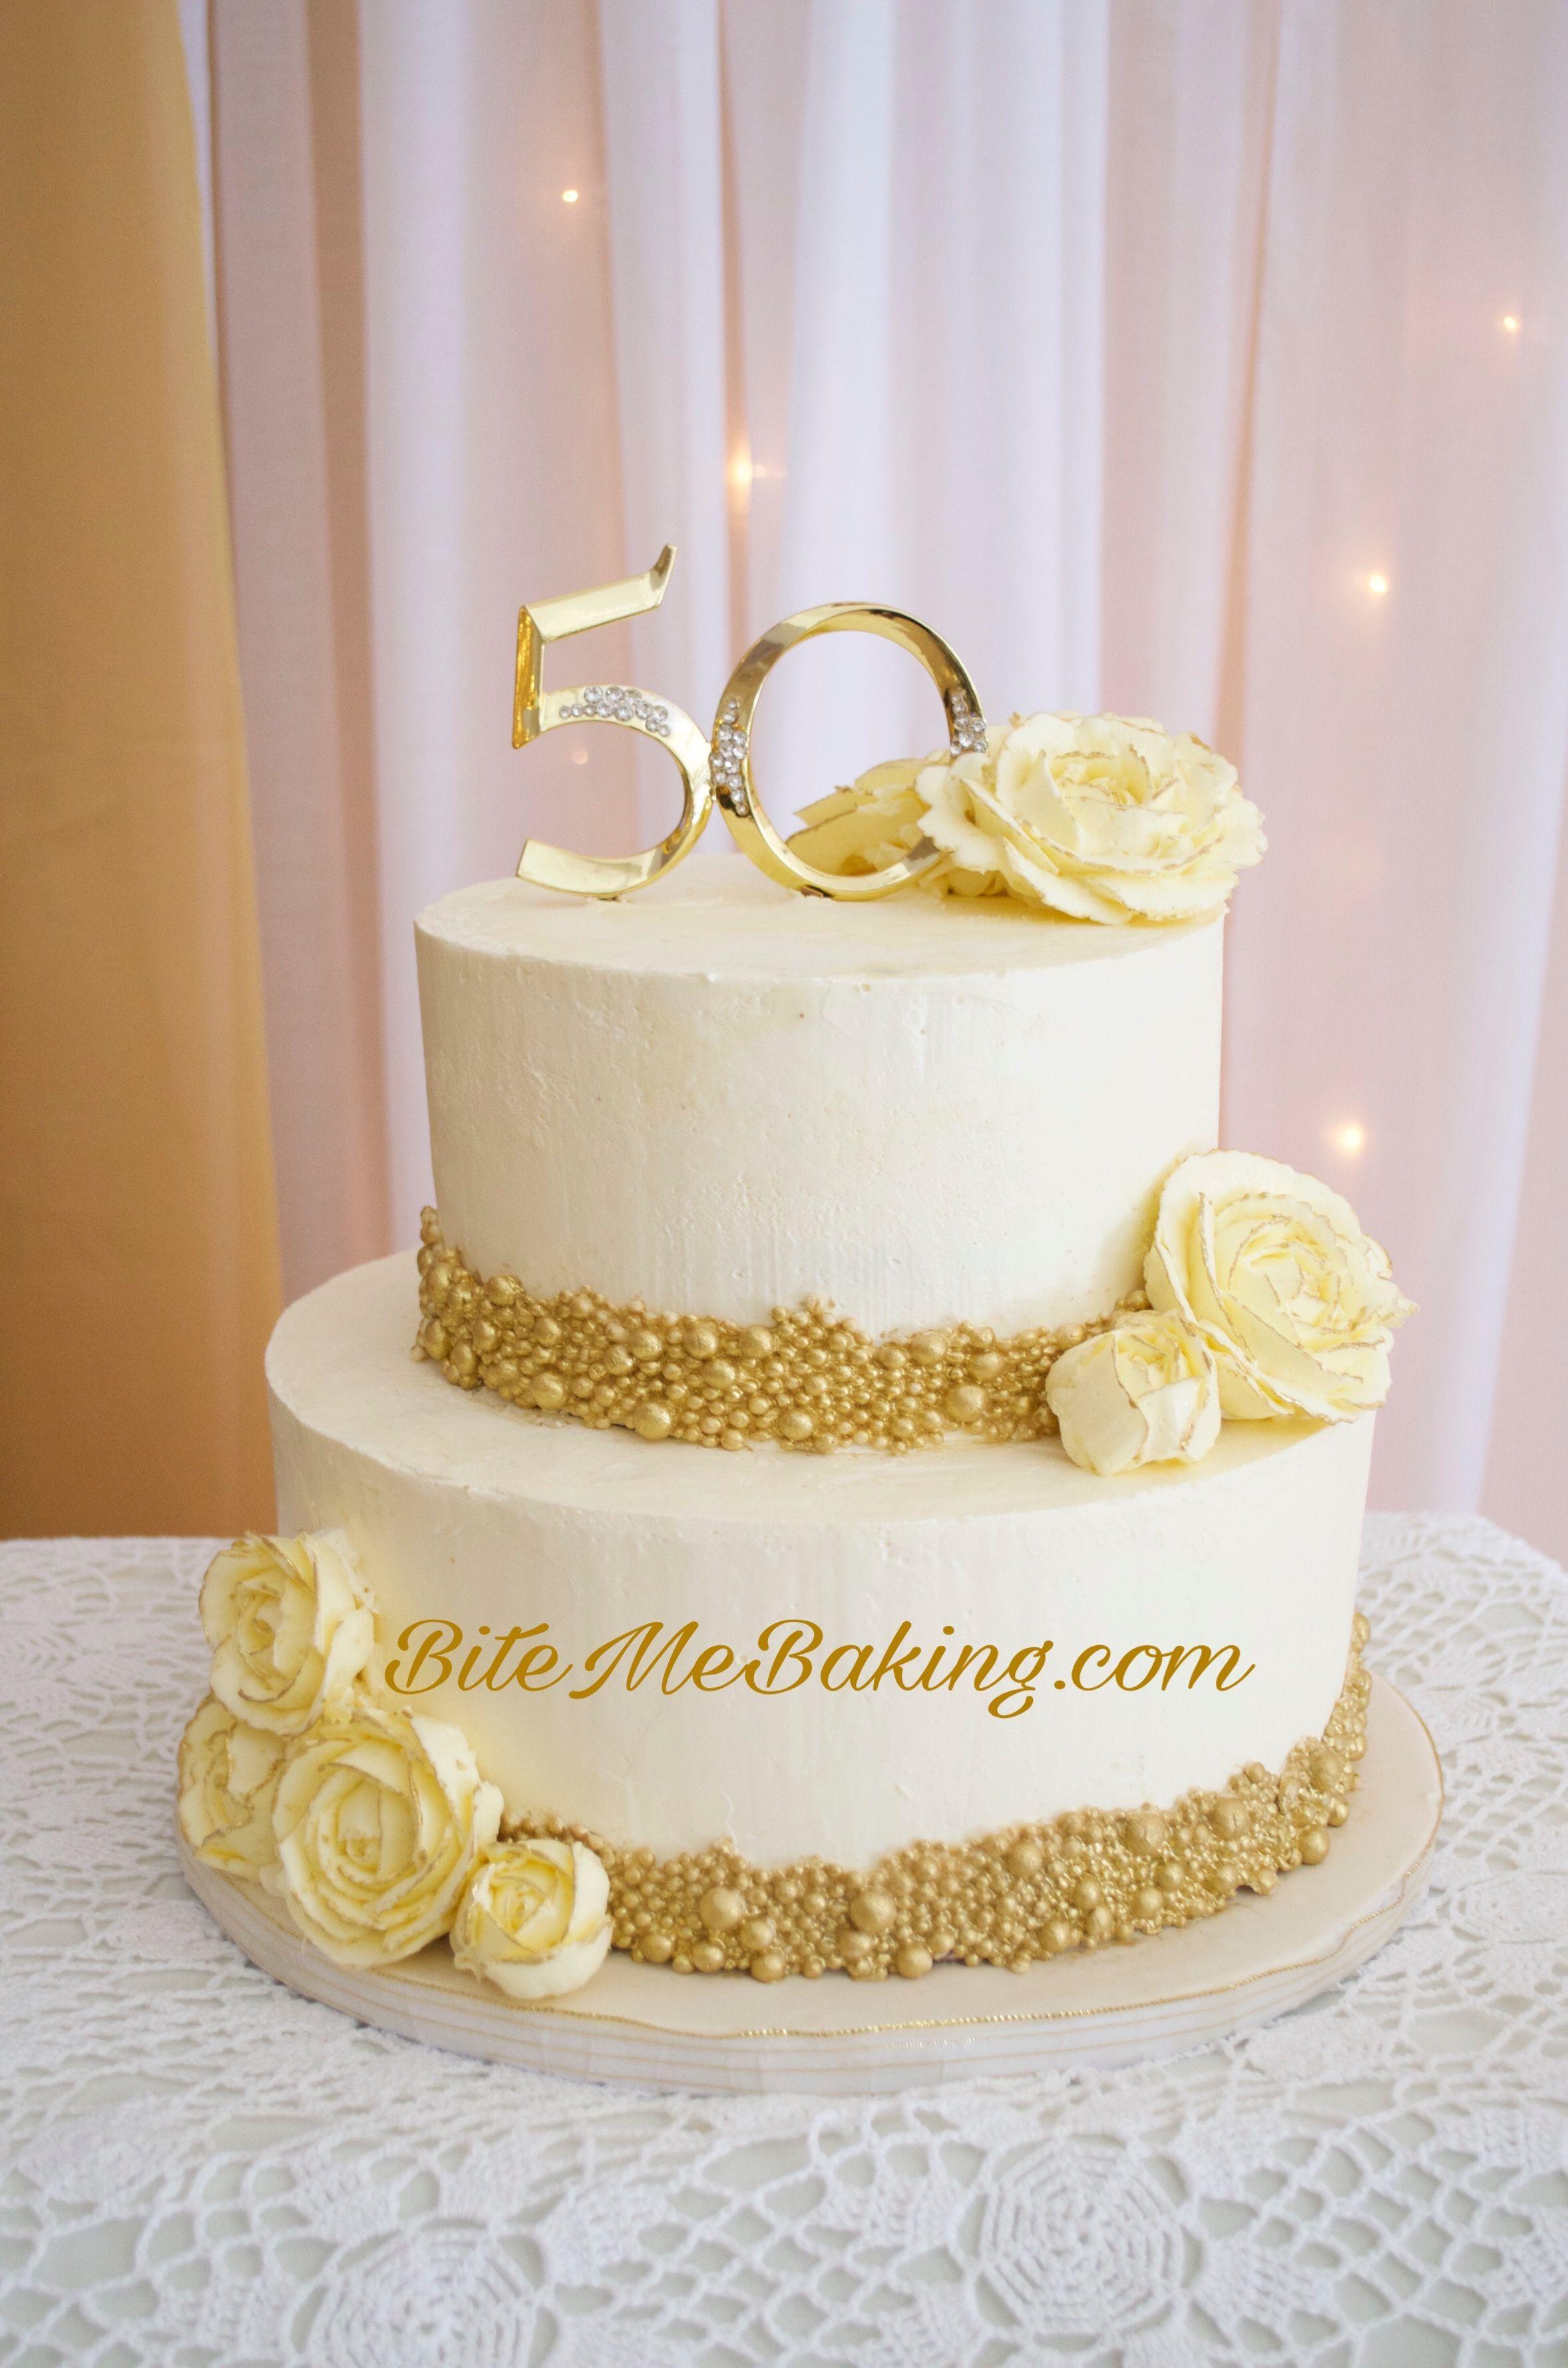 50th Anniversary Cakes, Wedding